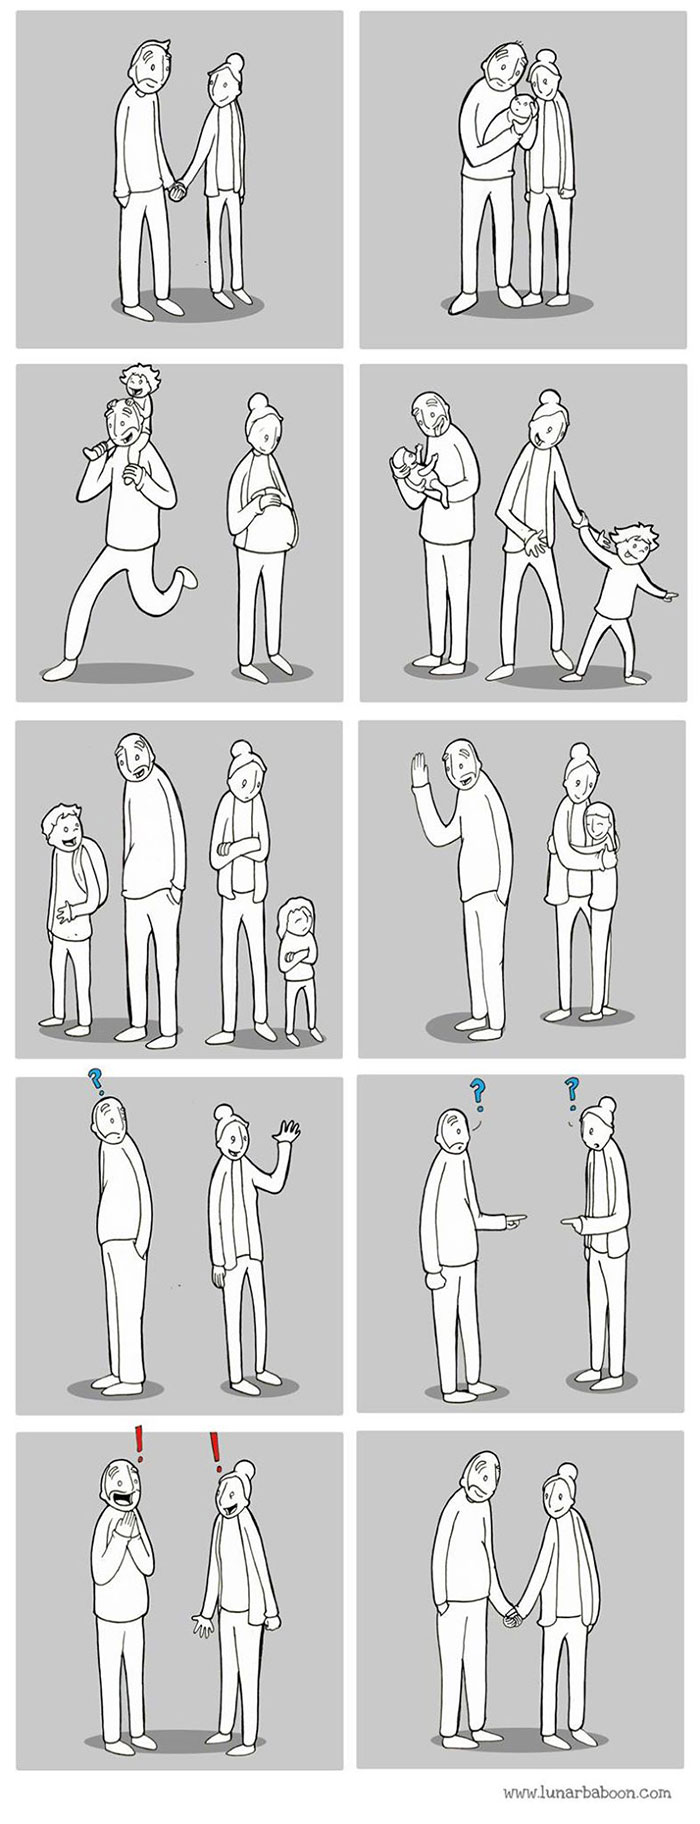 comics-padre-hijo-lunarbaboon-9